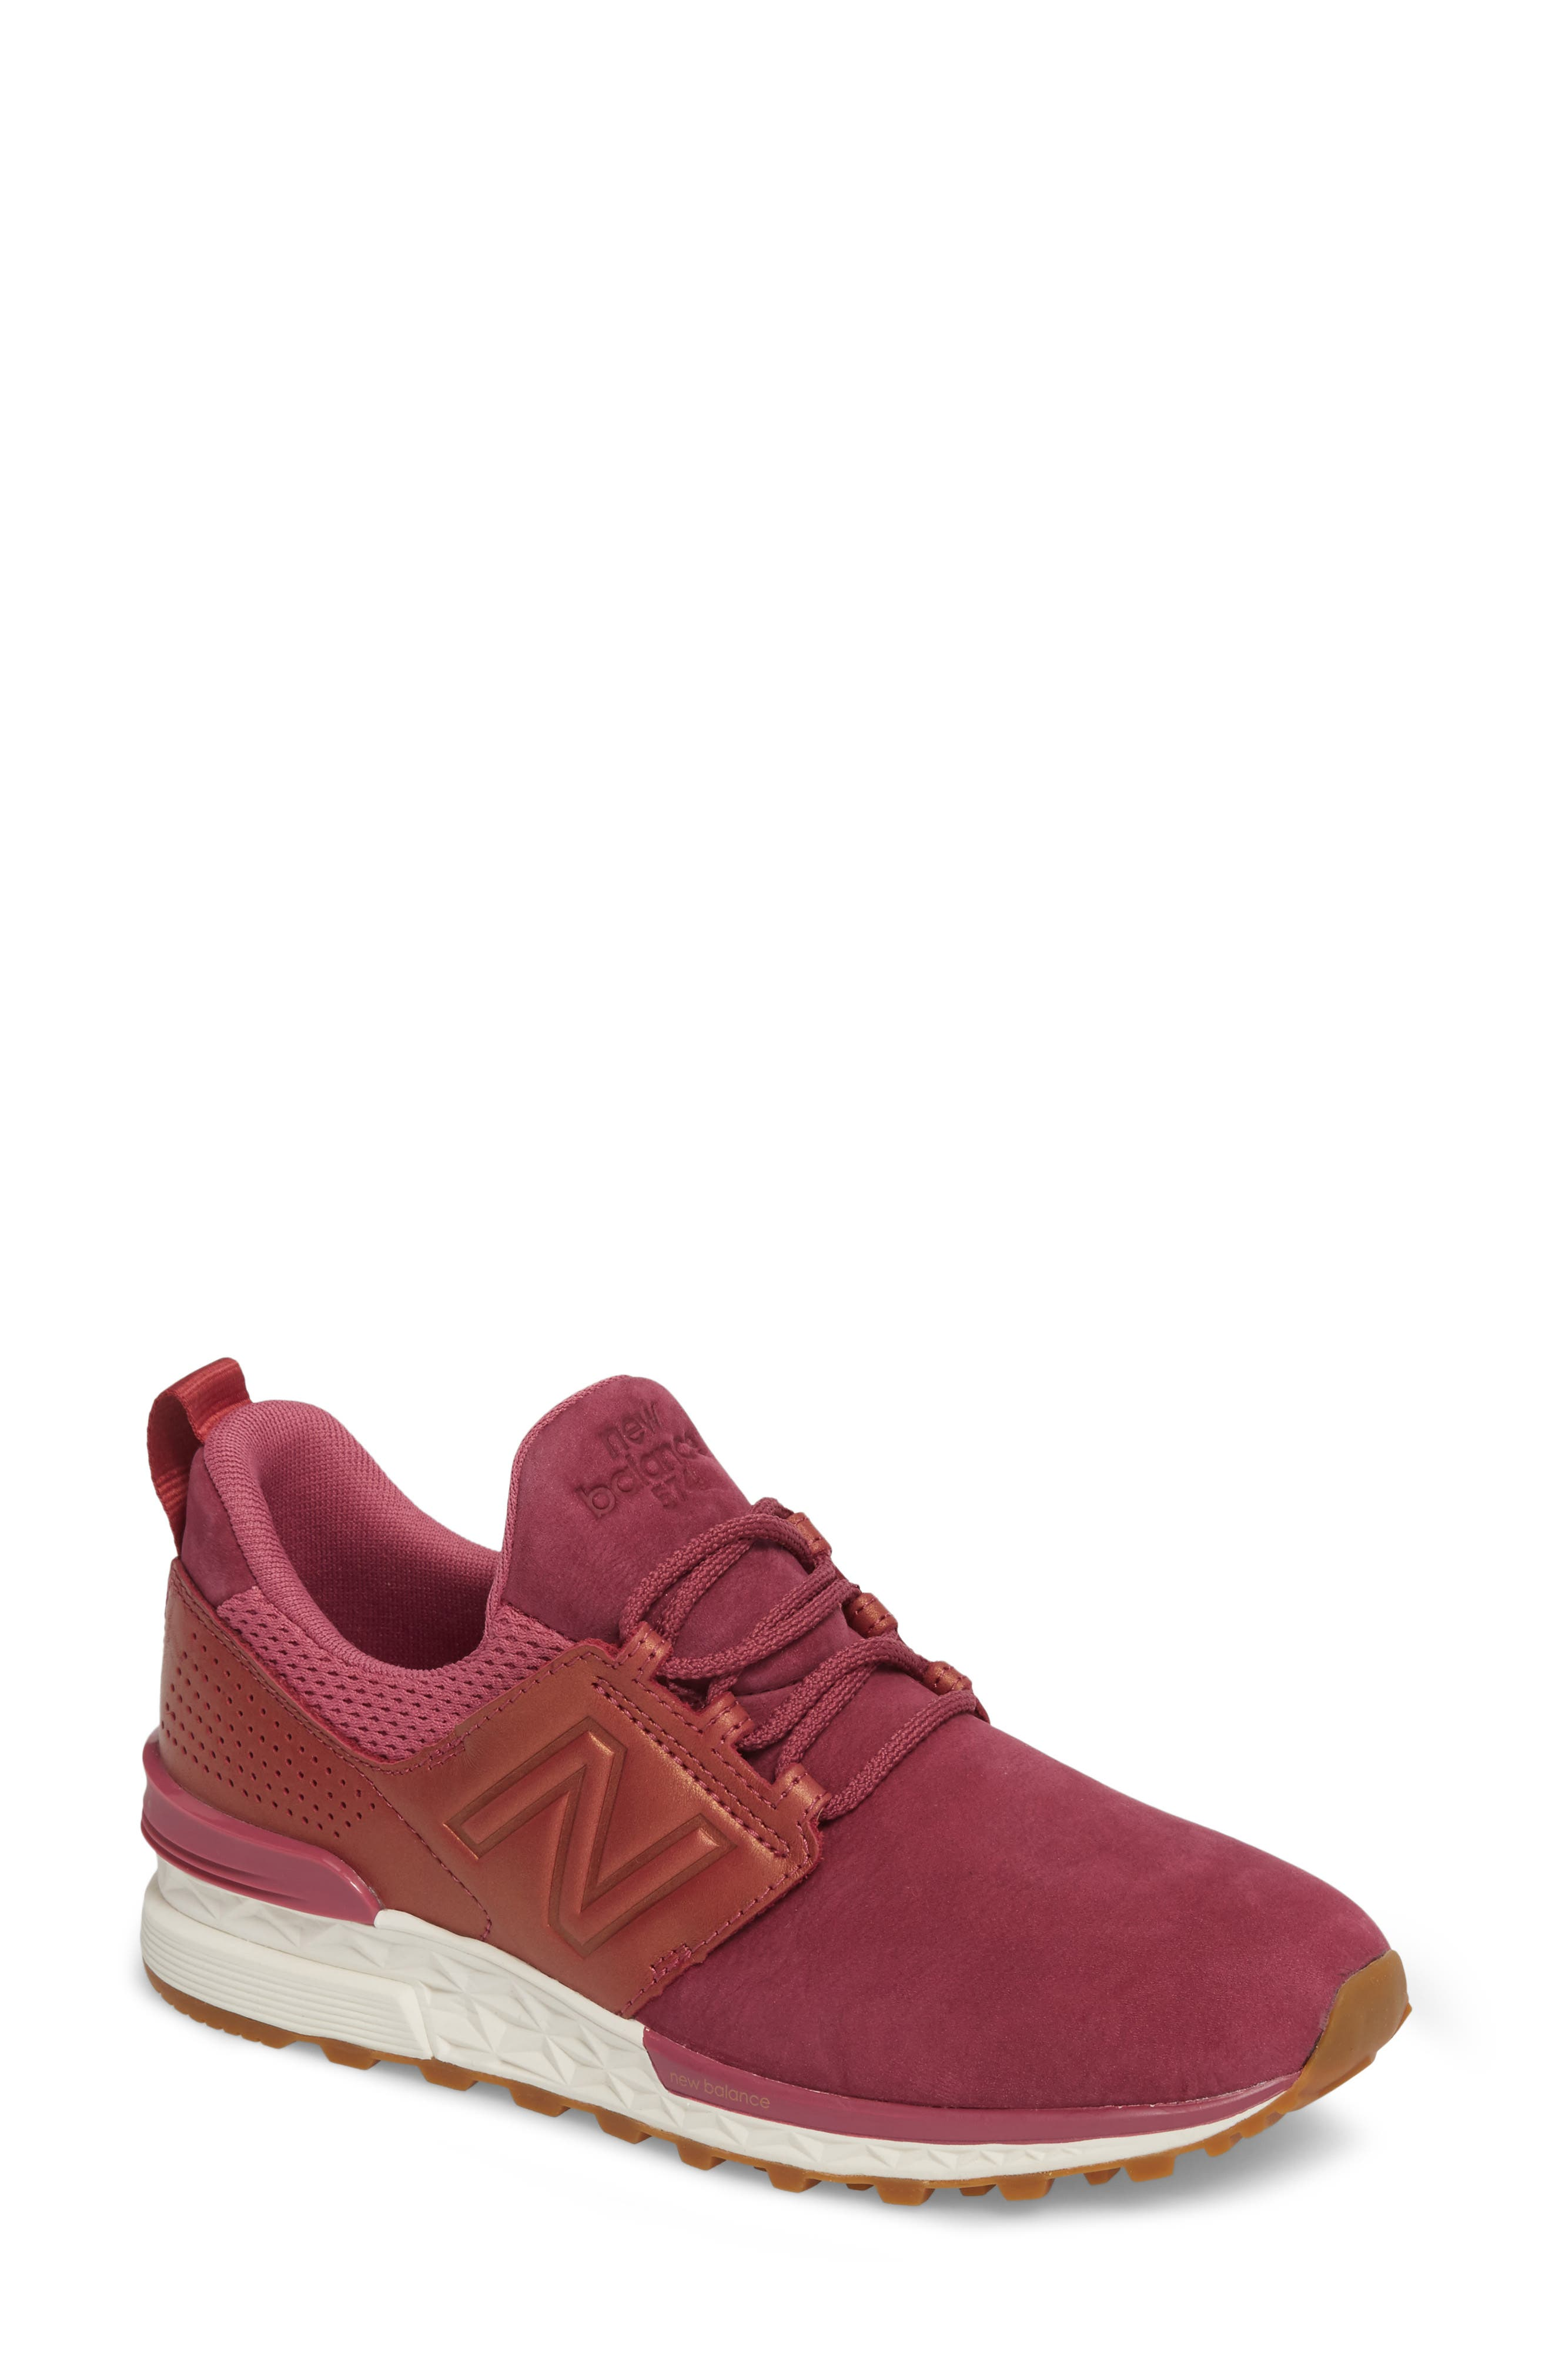 NEW BALANCE Nubuck 574 Sport Sneaker, Main, color, 600